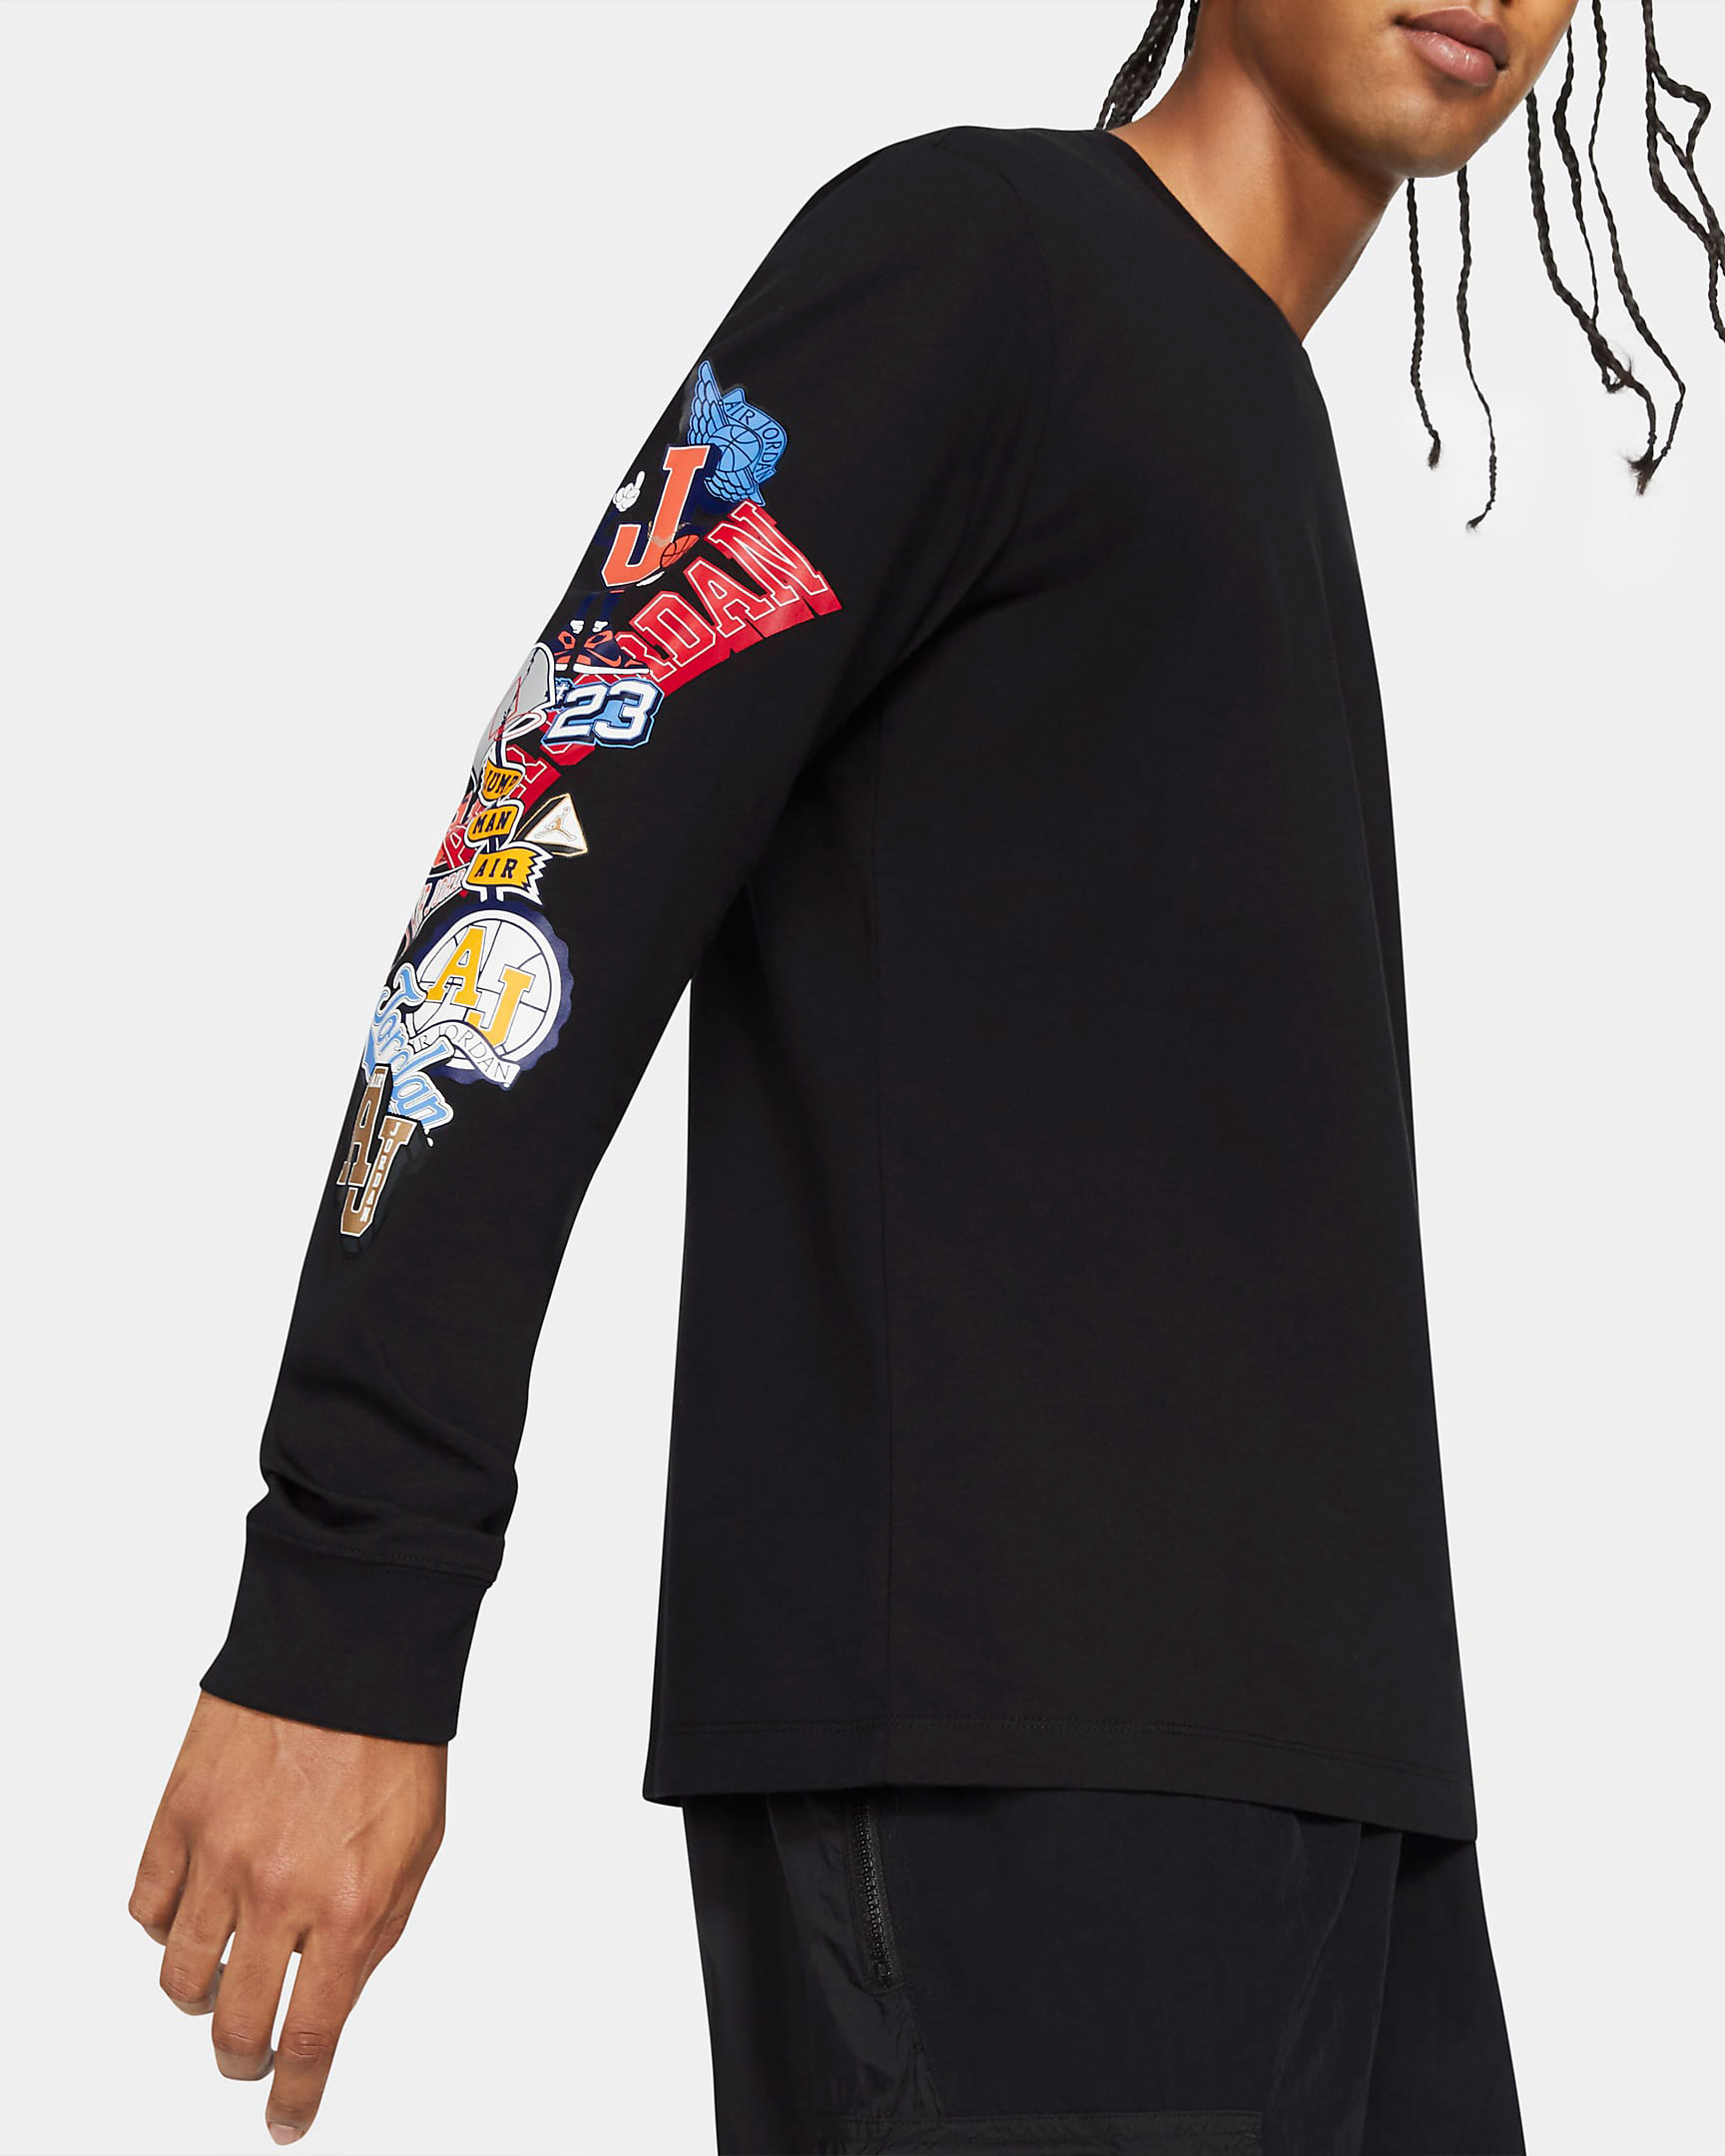 jordan-varsity-long-sleeve-shirt-black-4